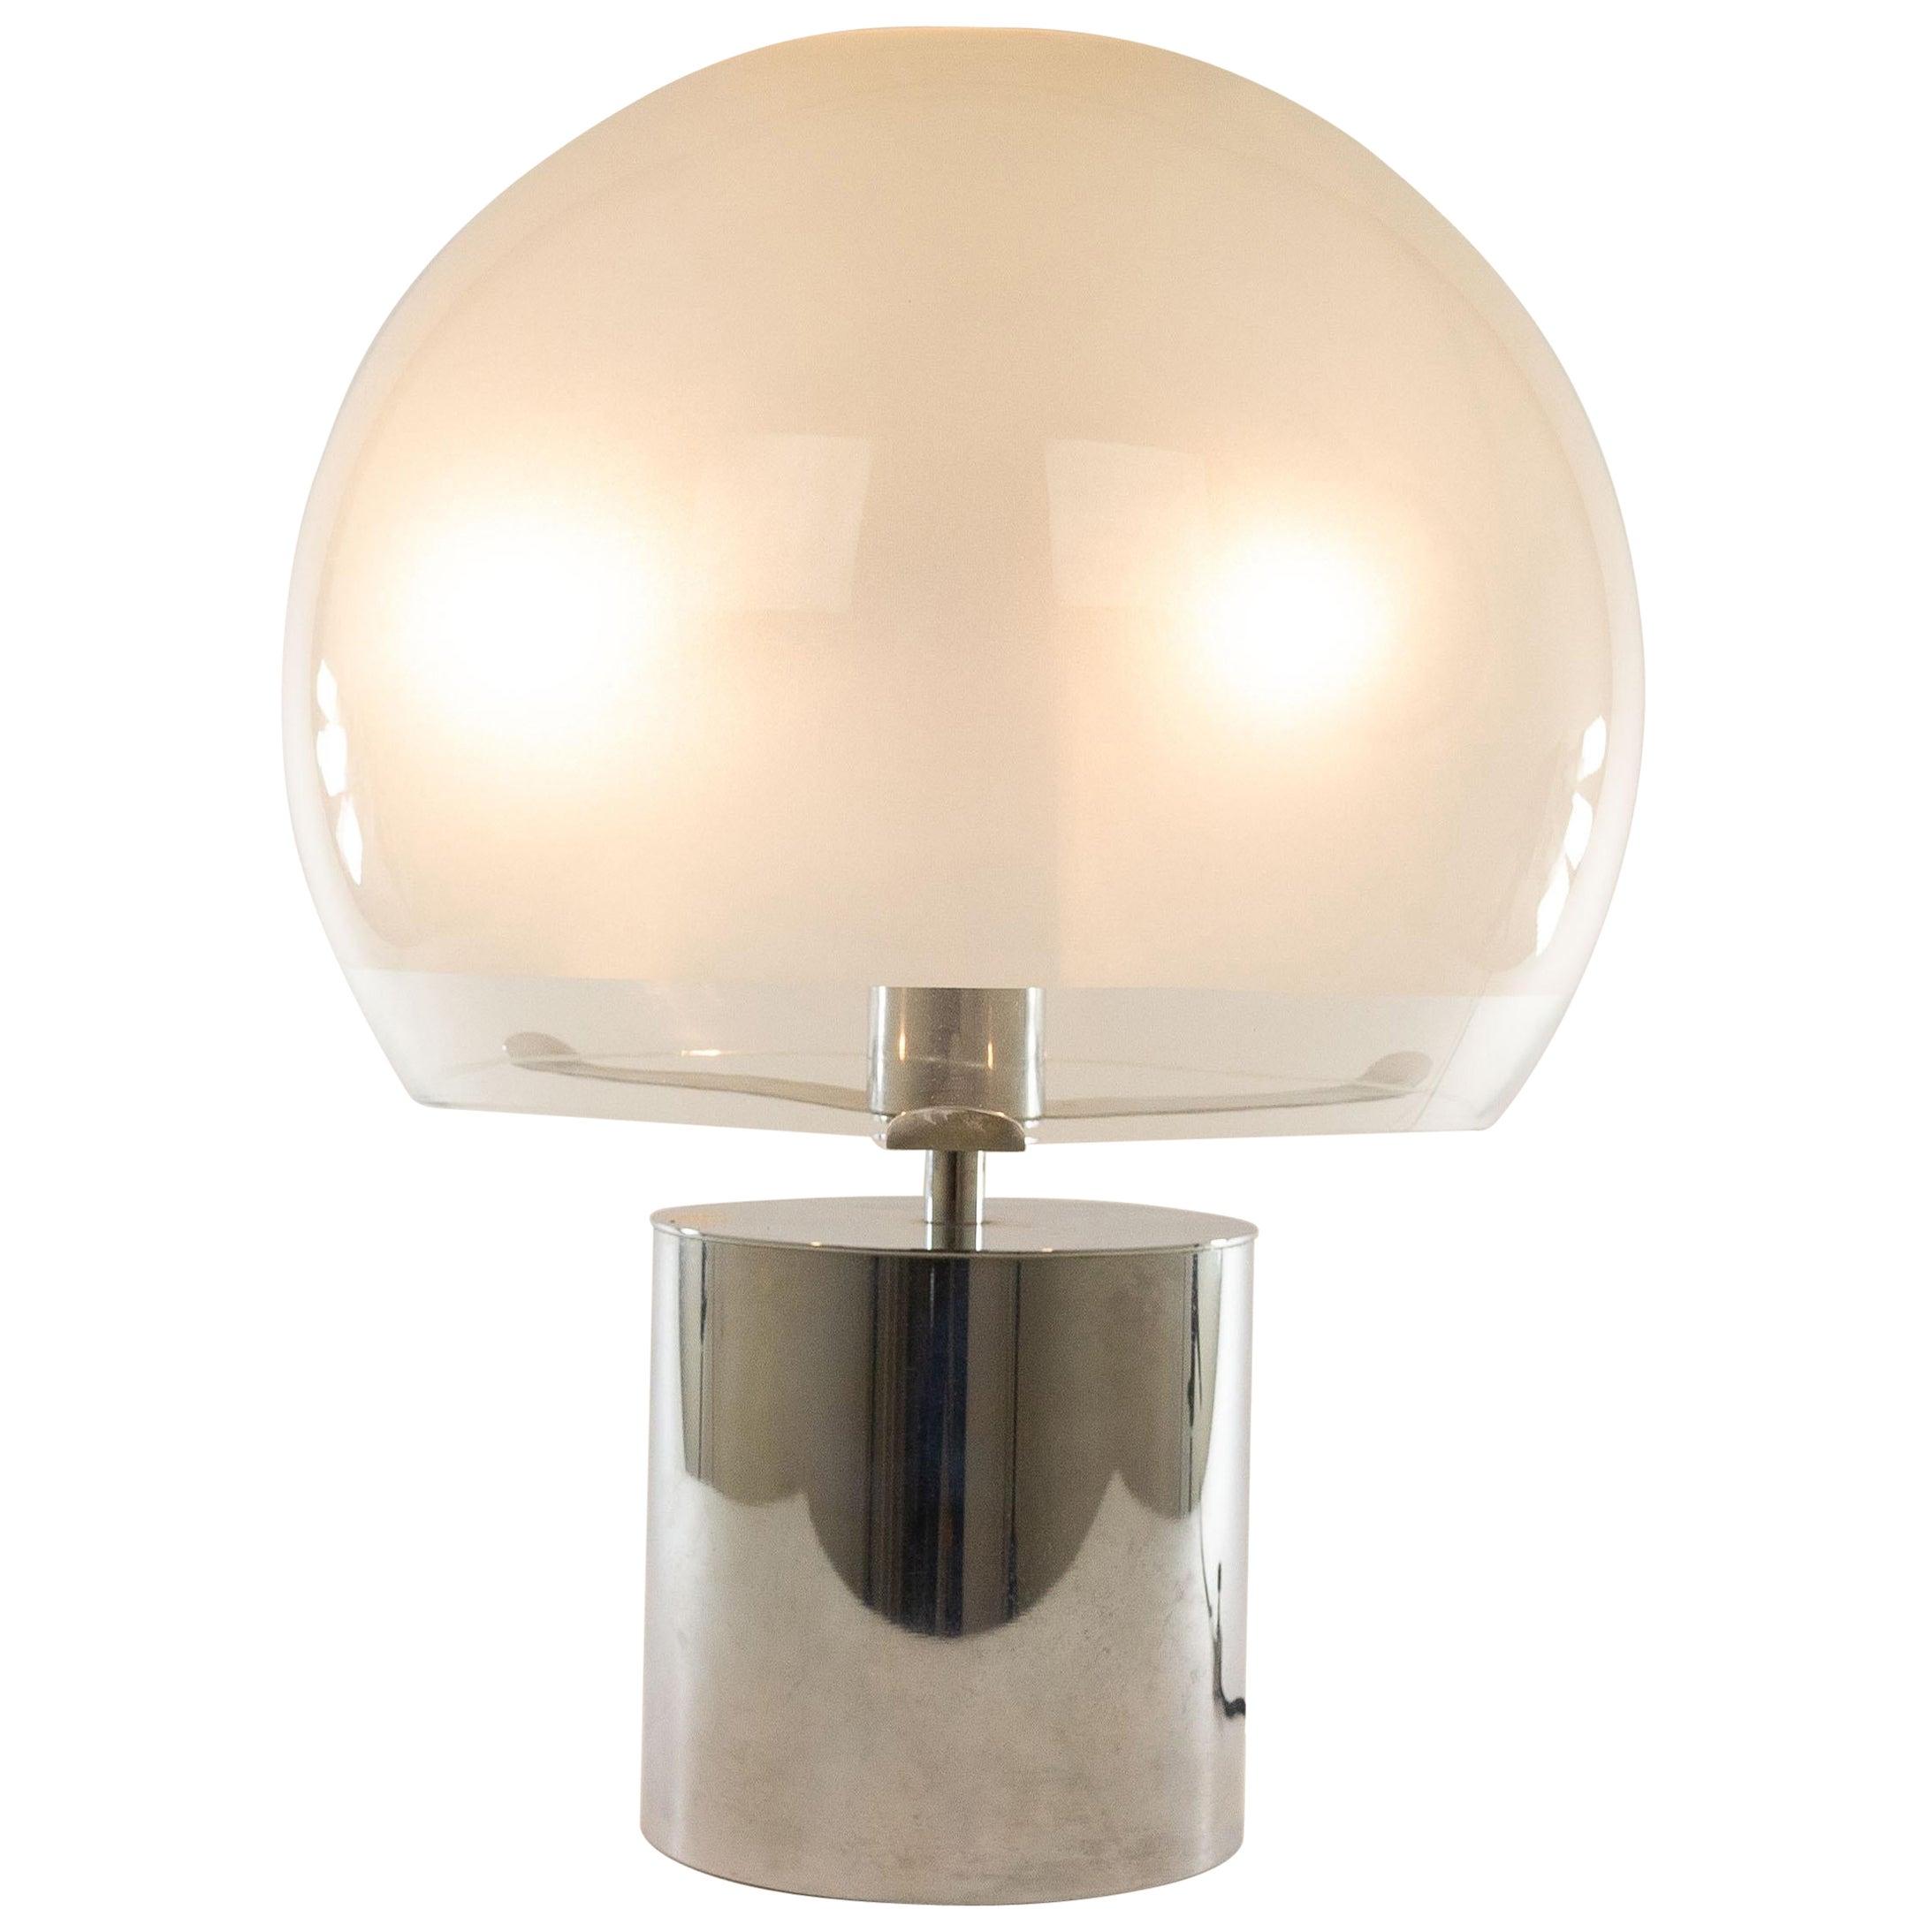 Porcino Table or Floor Lamp by Luigi Caccia Dominioni for Azucena, 1960s